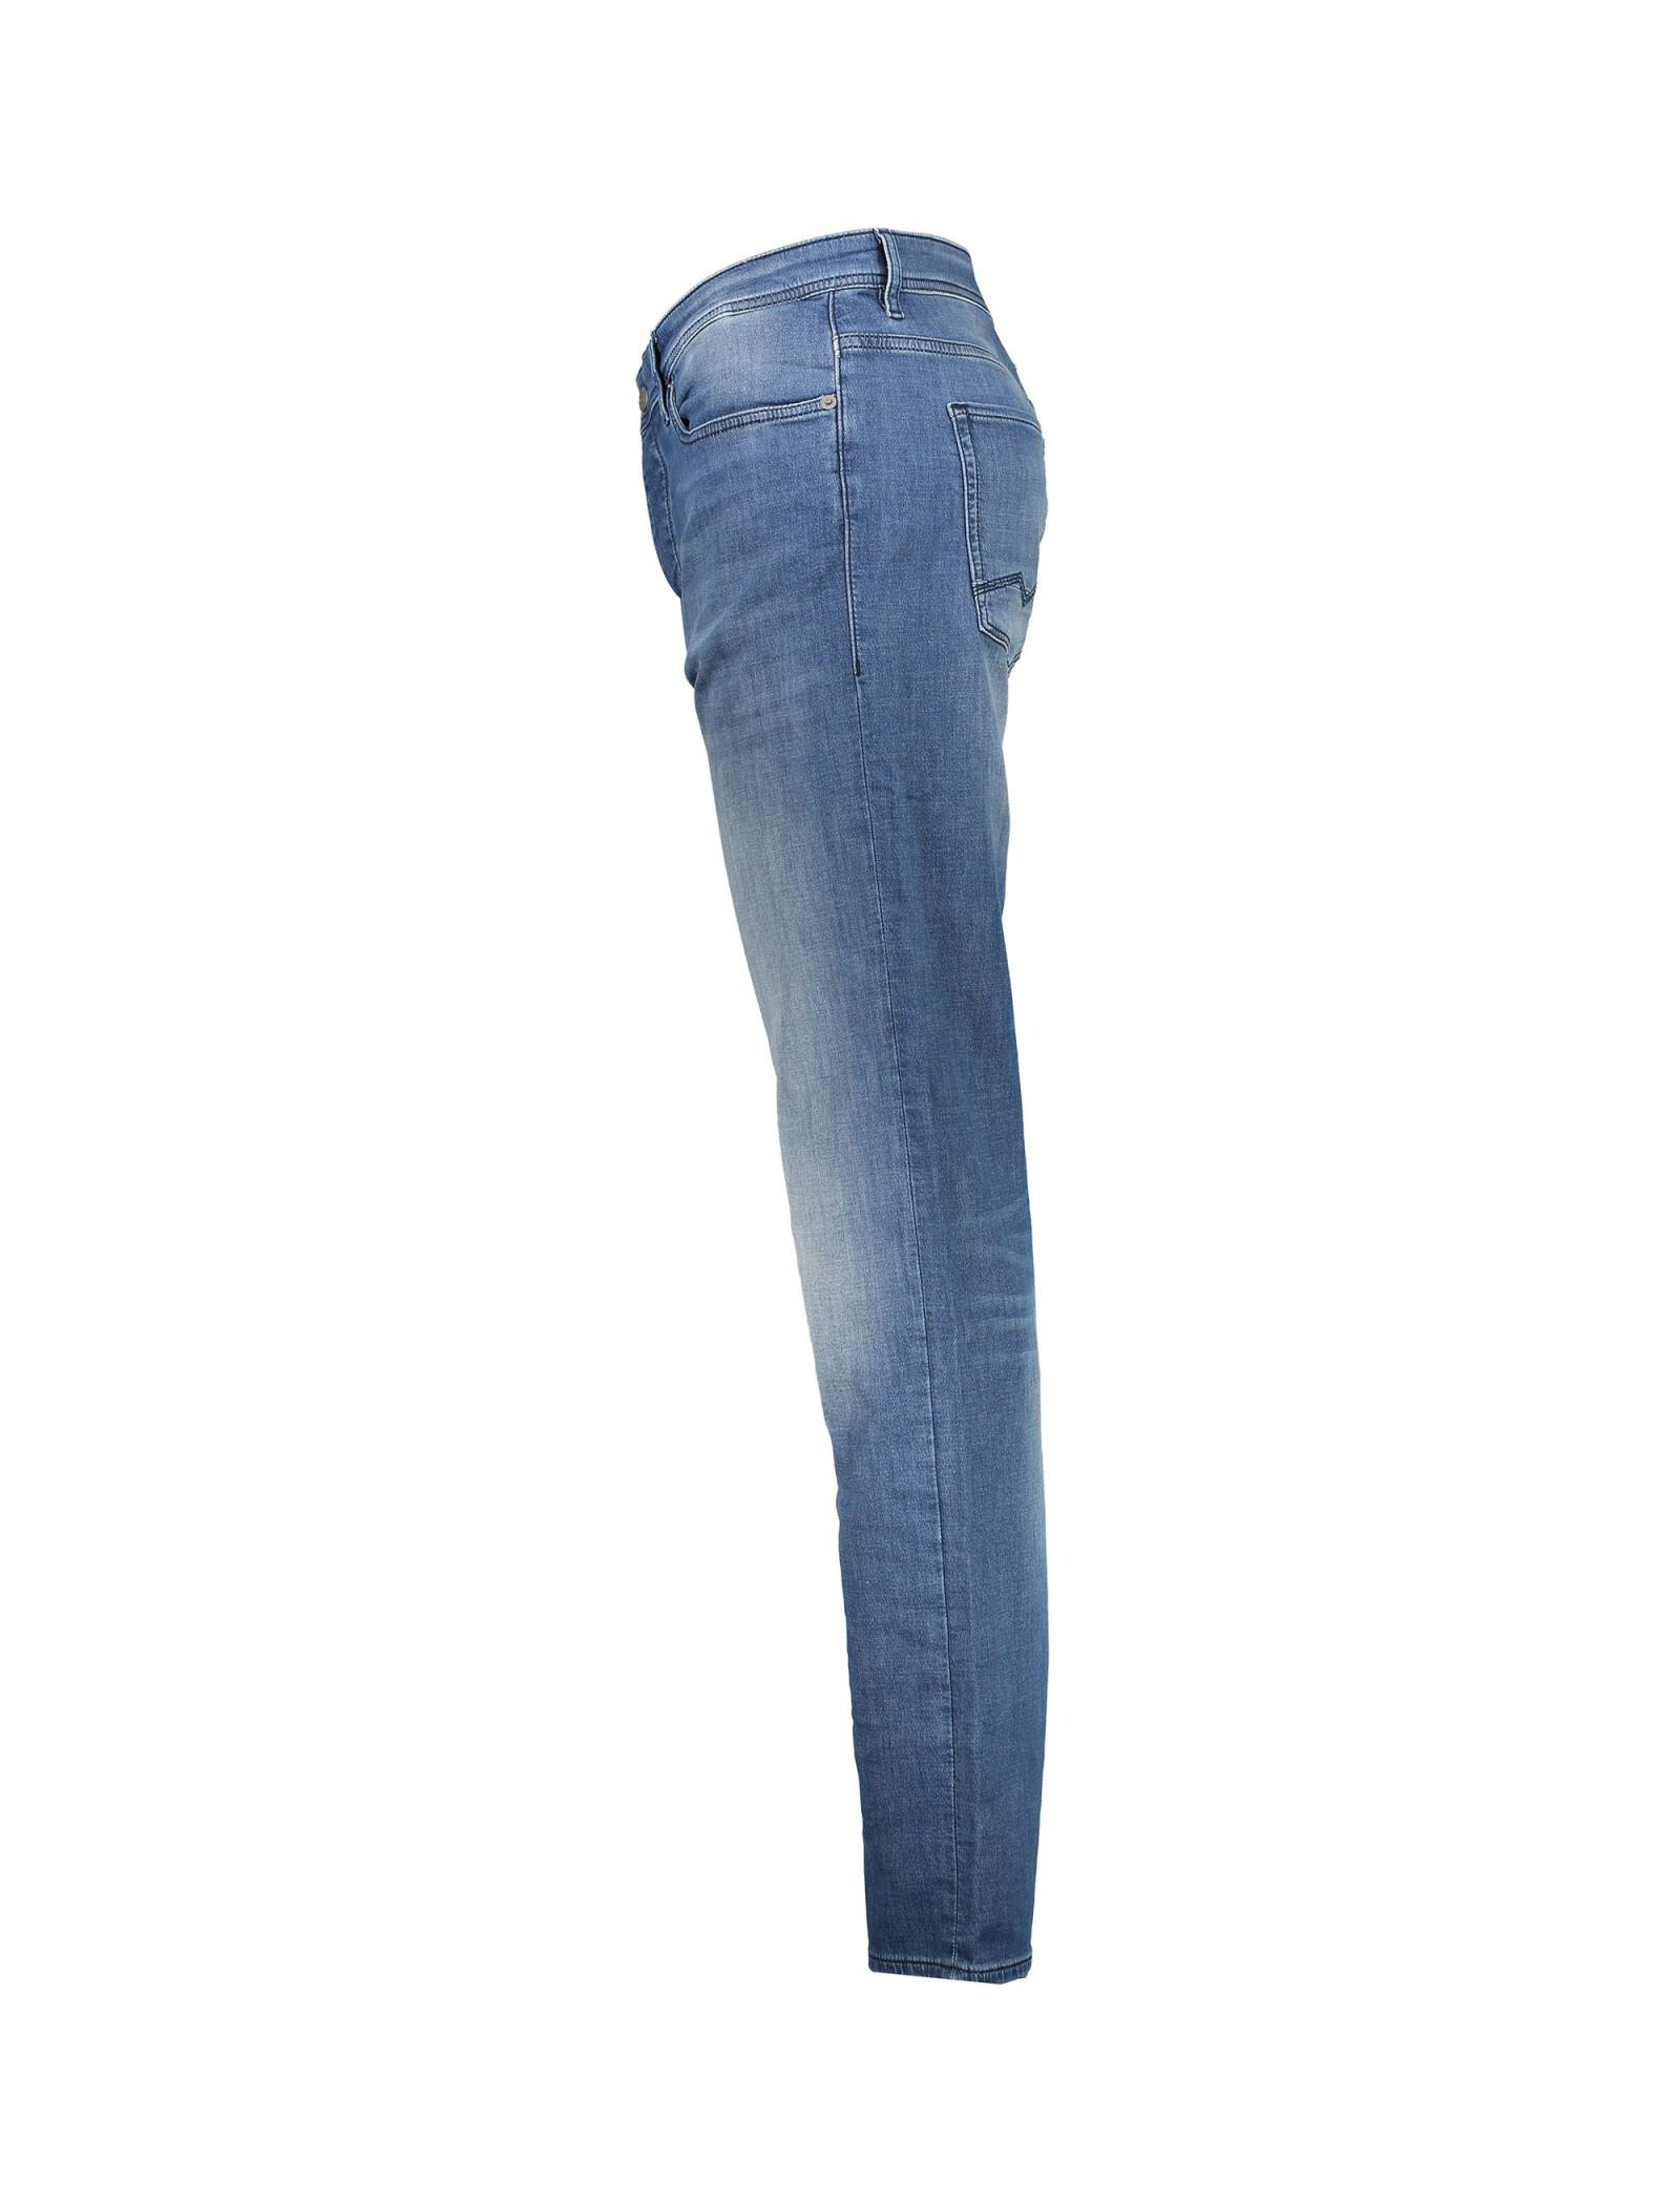 شلوار جین راسته مردانه Orange90-P SUAVE - باس اورنج - آبي تيره - 4